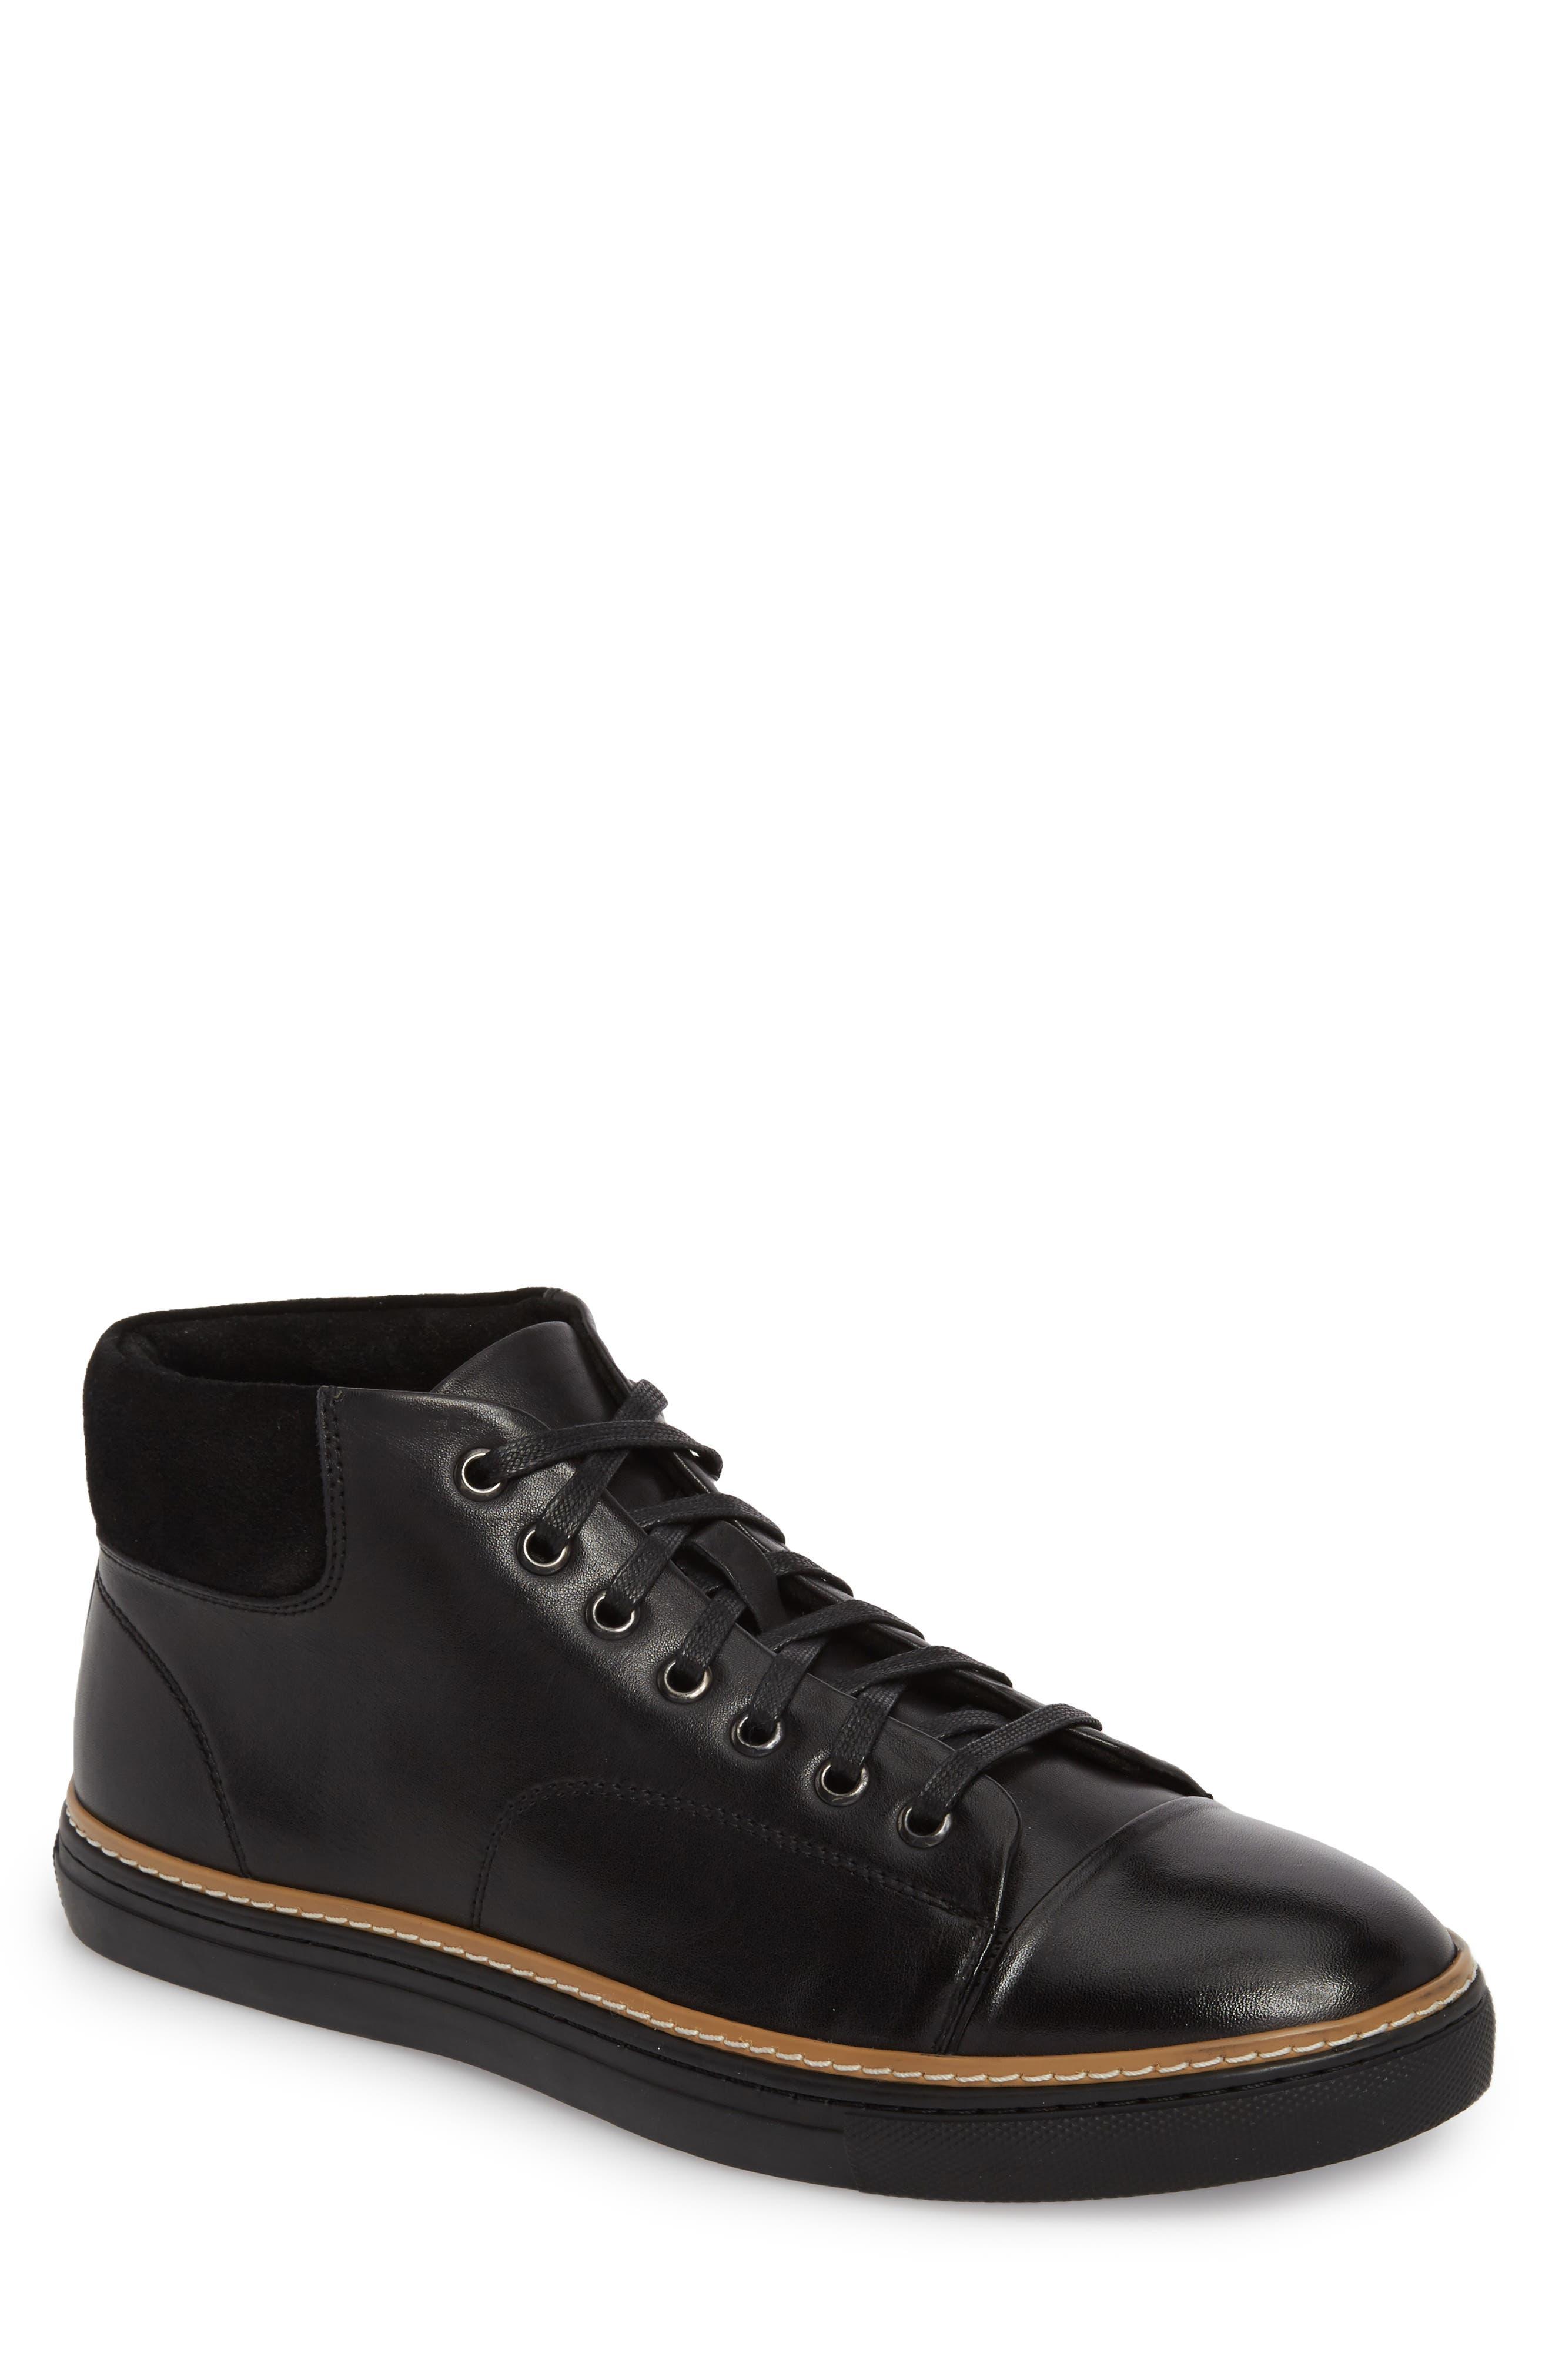 Grove Sneaker,                             Main thumbnail 1, color,                             BLACK LEATHER